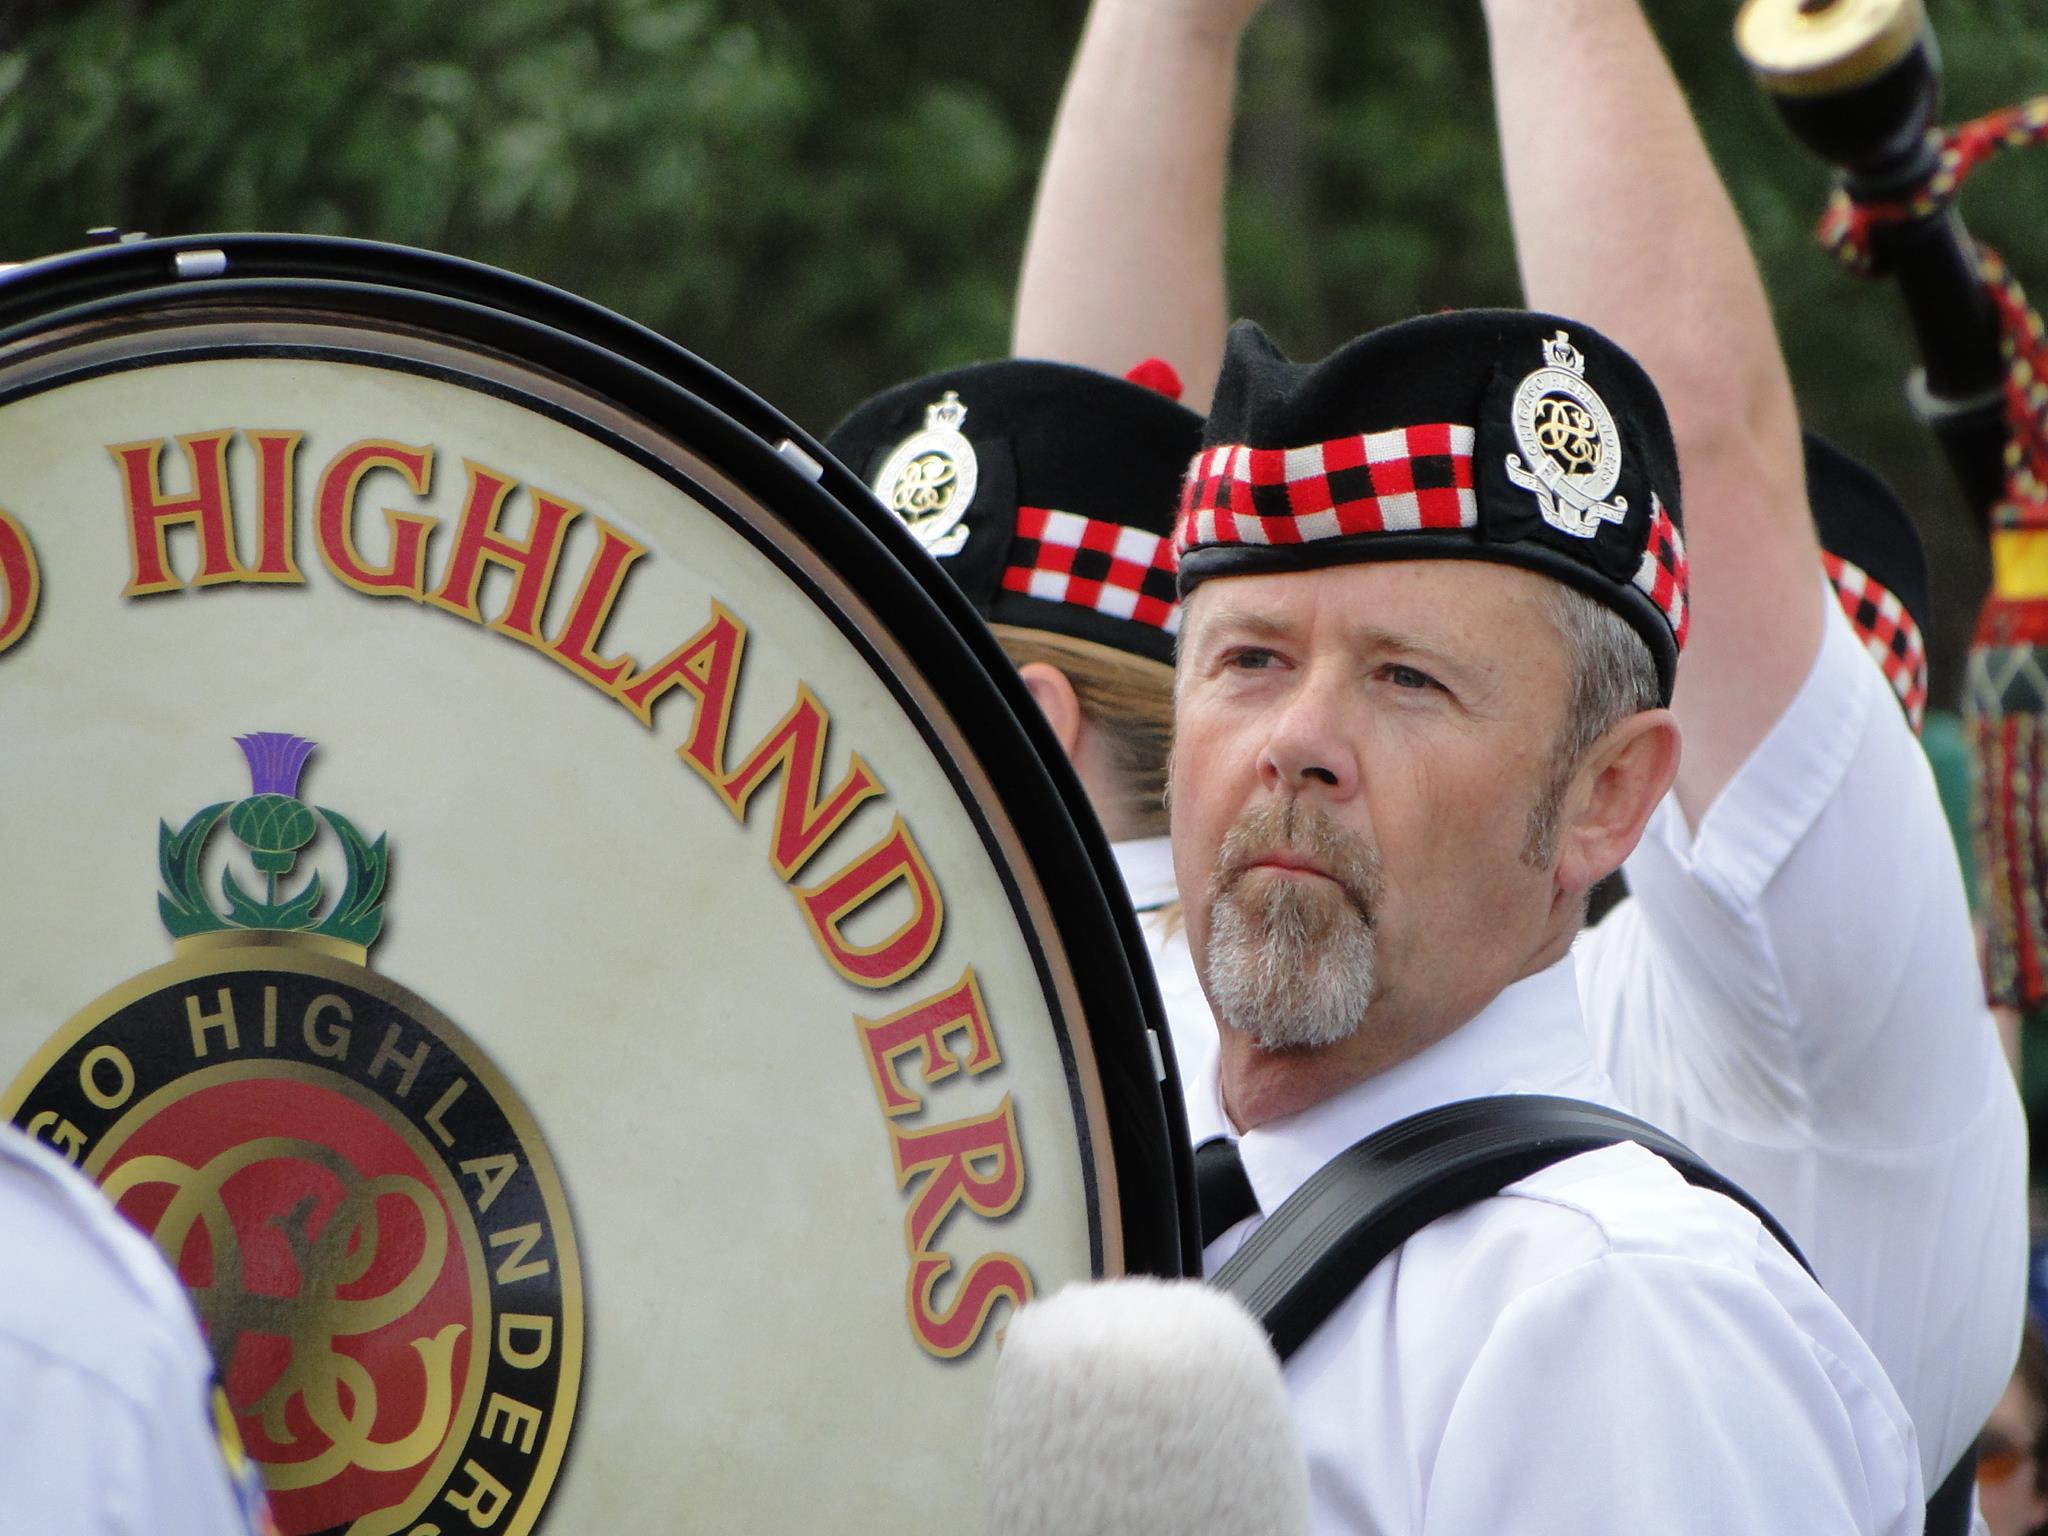 Highlanders-bass.jpg